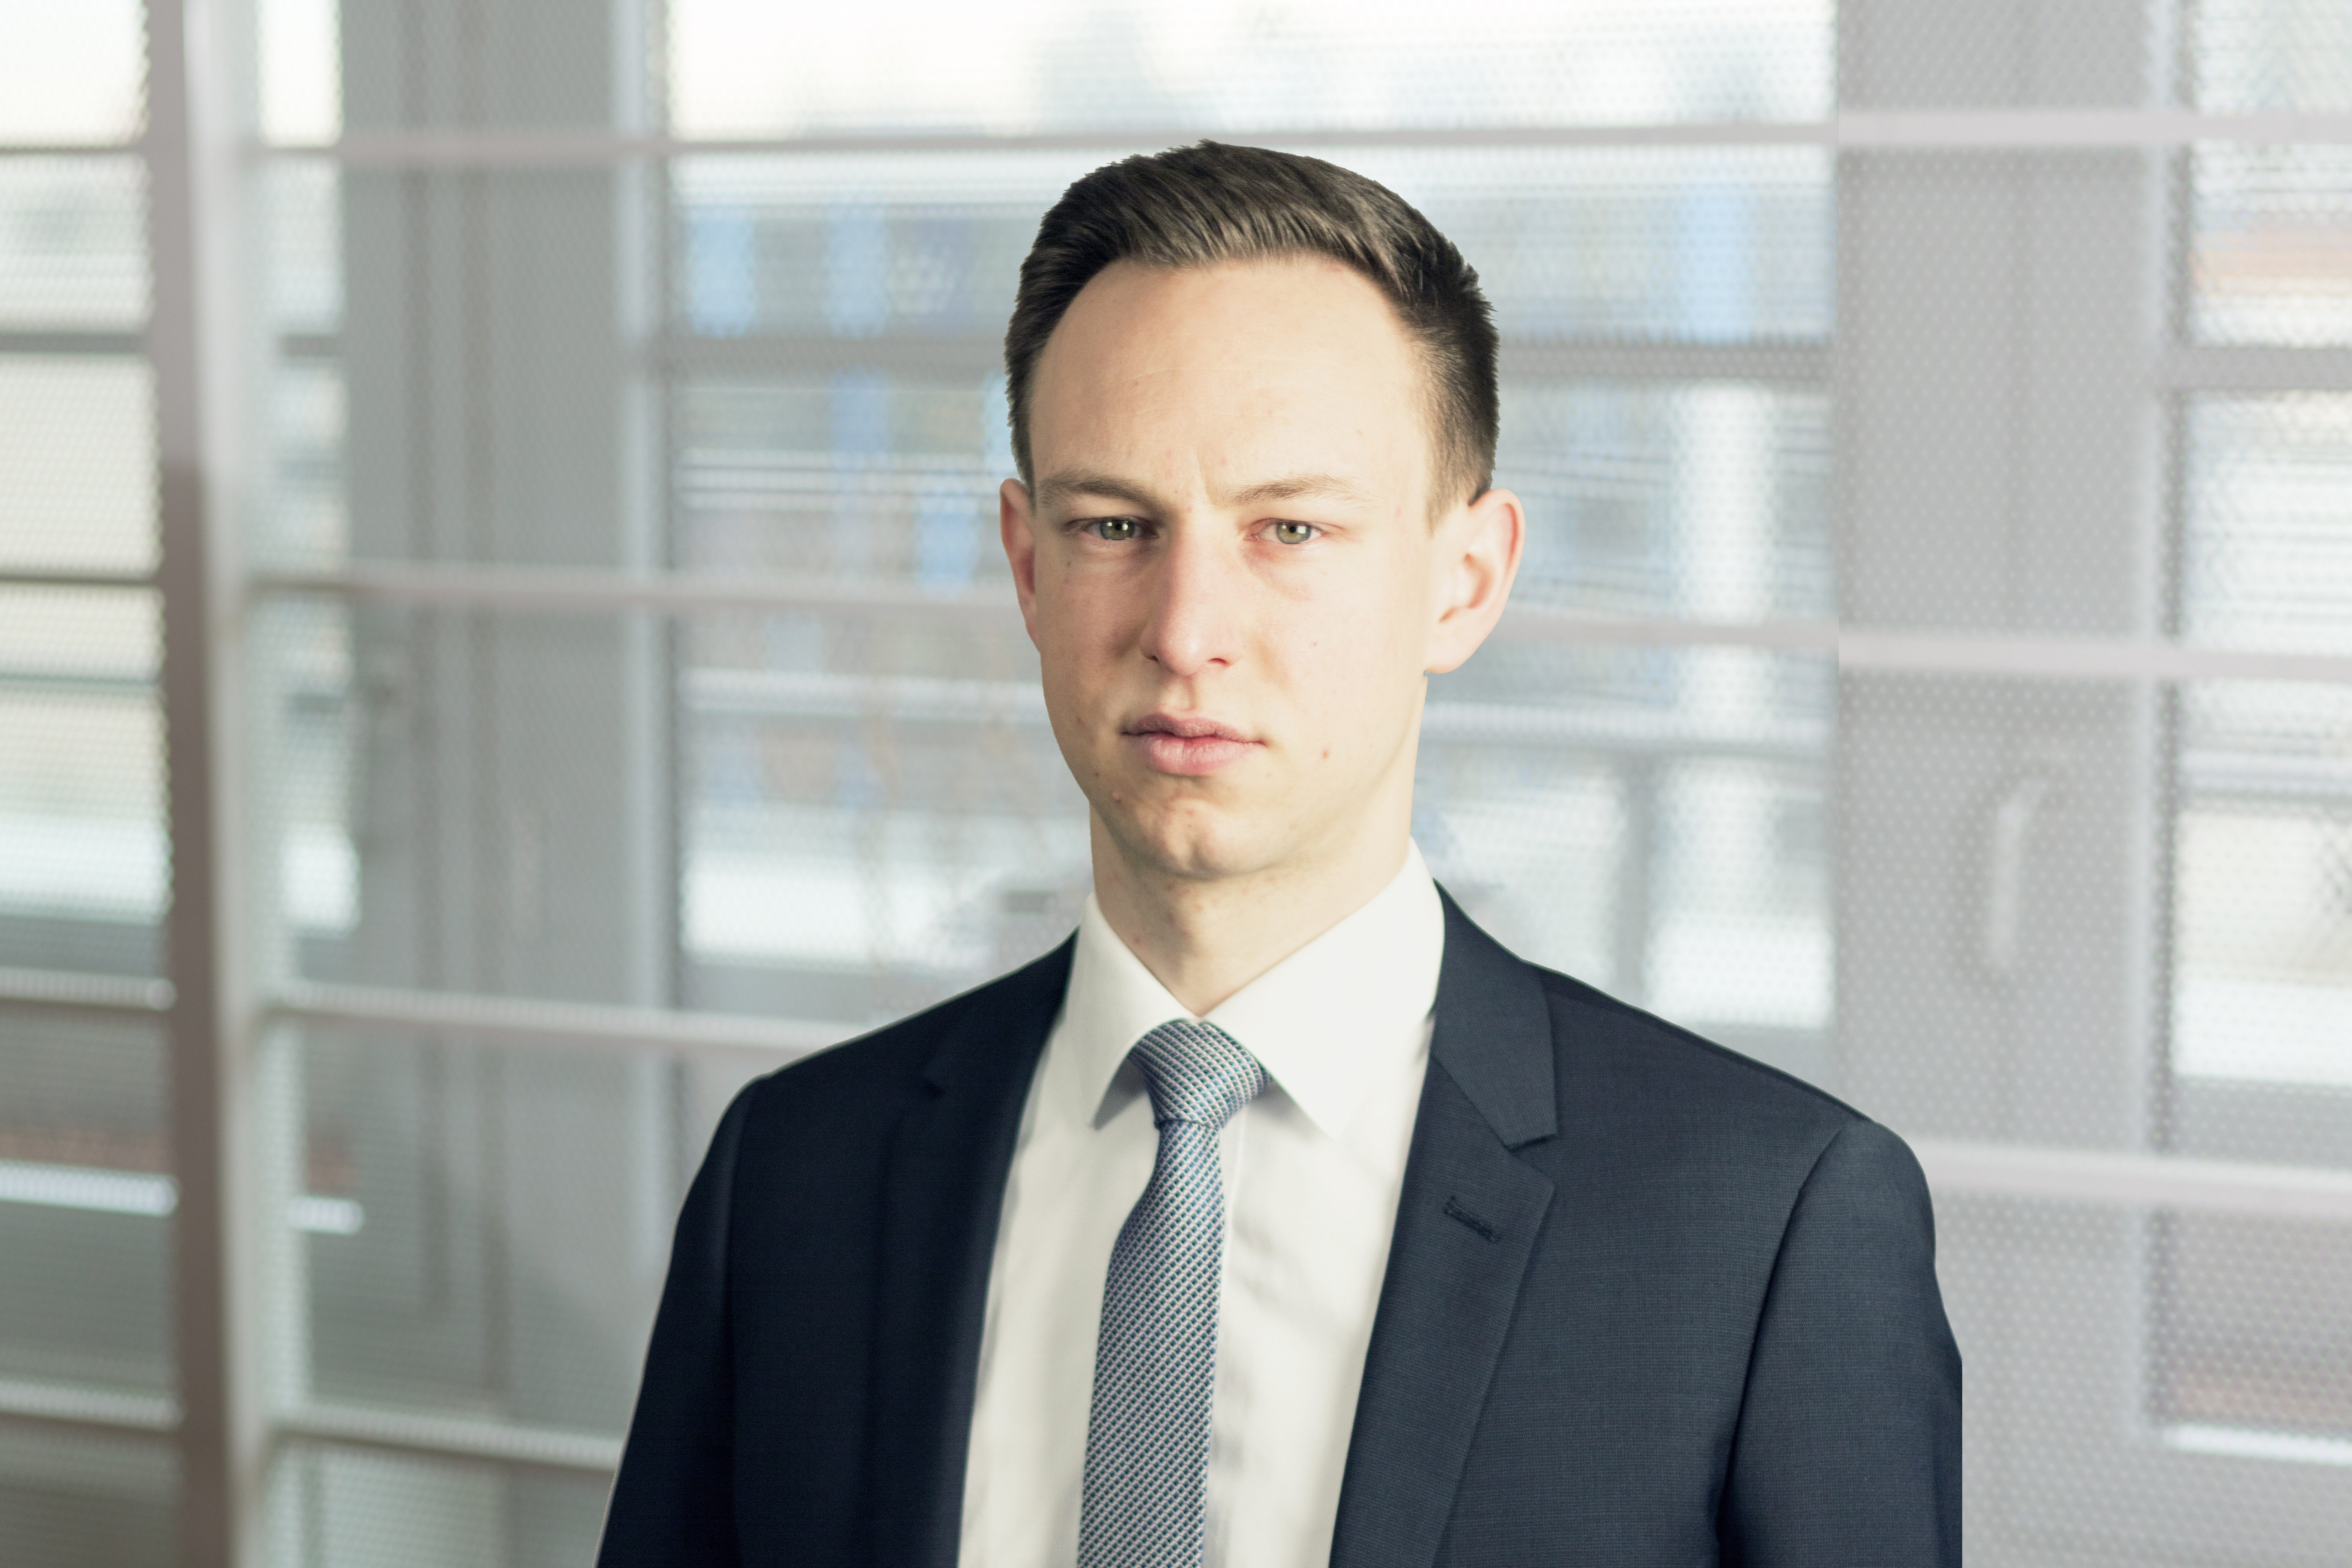 Portrait of Robert Dobroschke